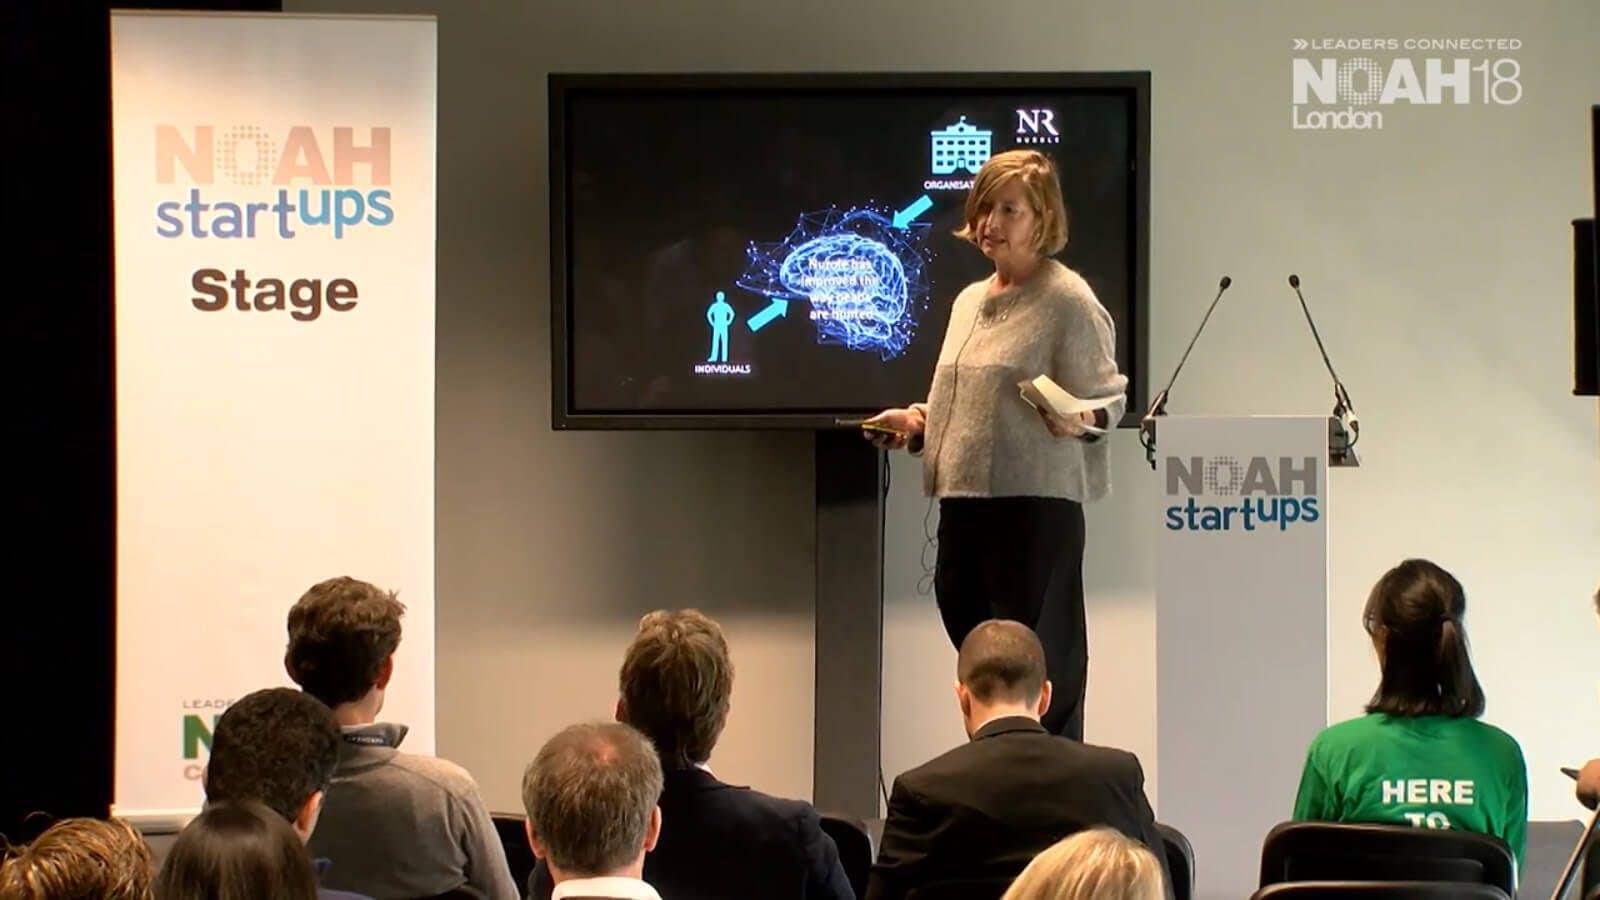 Nurole's CEO, Susie Cummings, speaking at London tech conference, Noah start ups